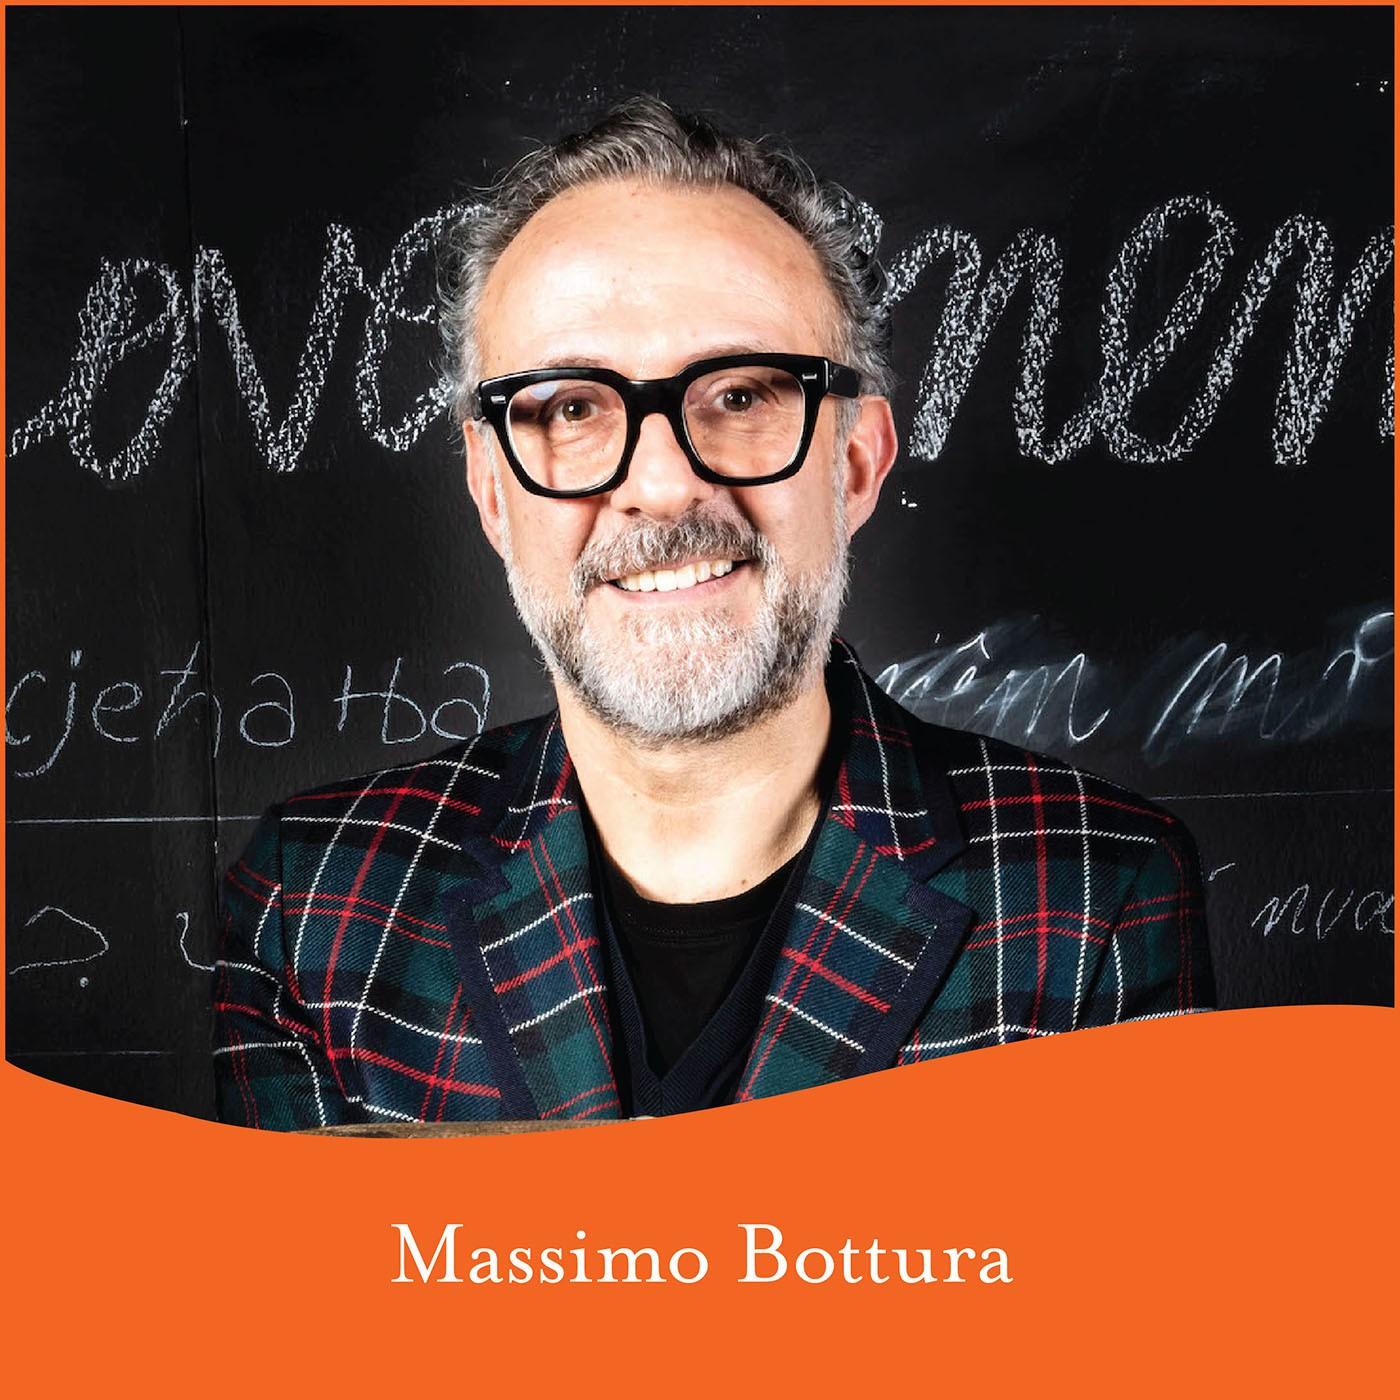 Identita' Golose 2019: Seminar with Massimo Bottura at SERRA by Birreria